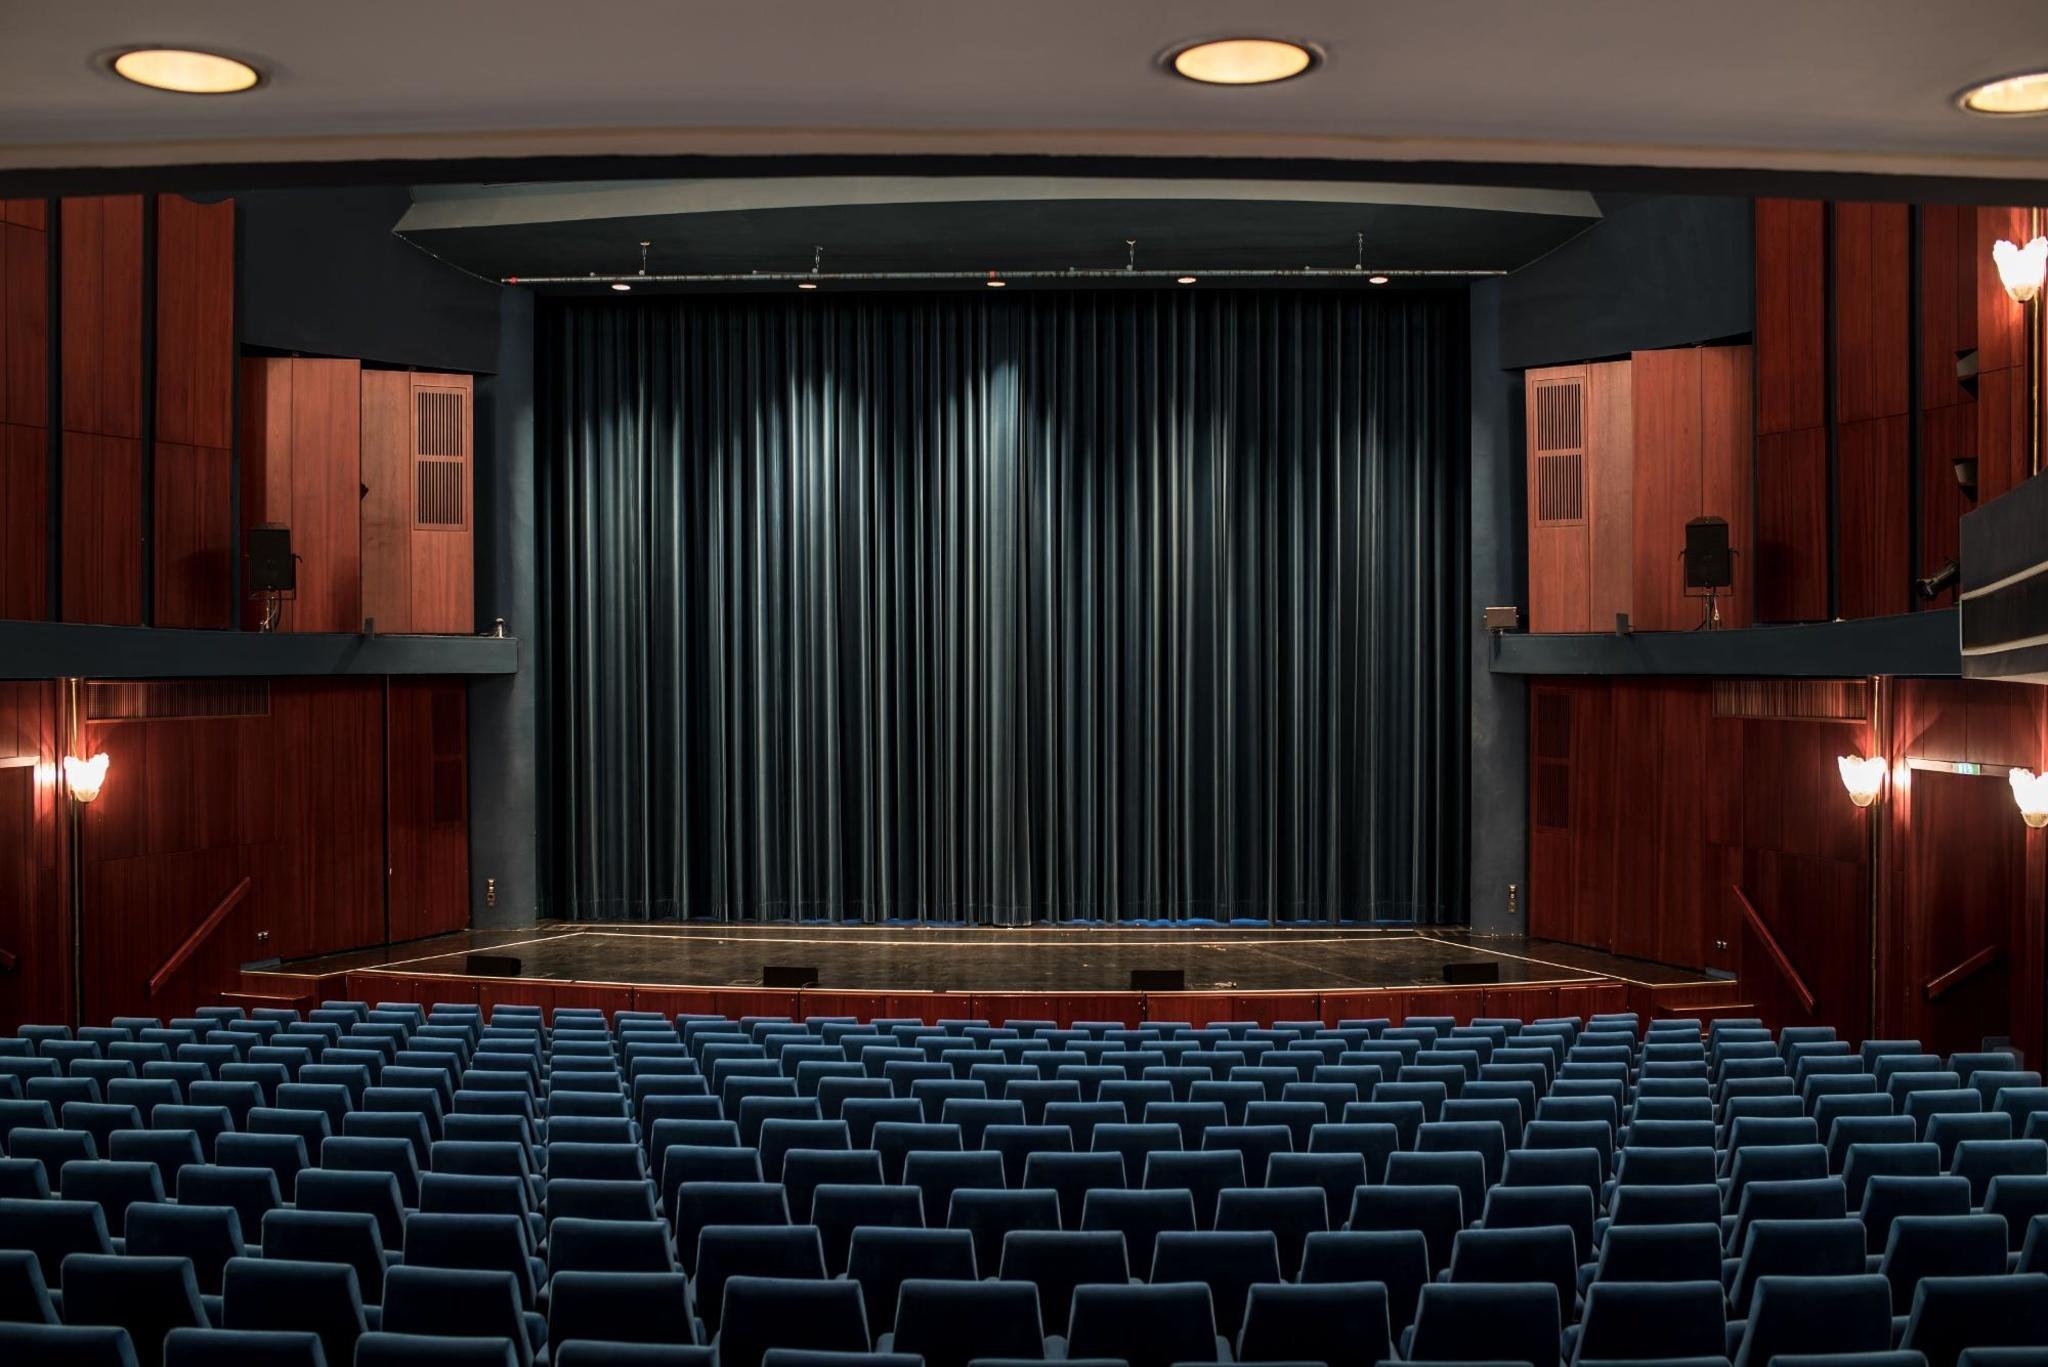 Kino In Homburg